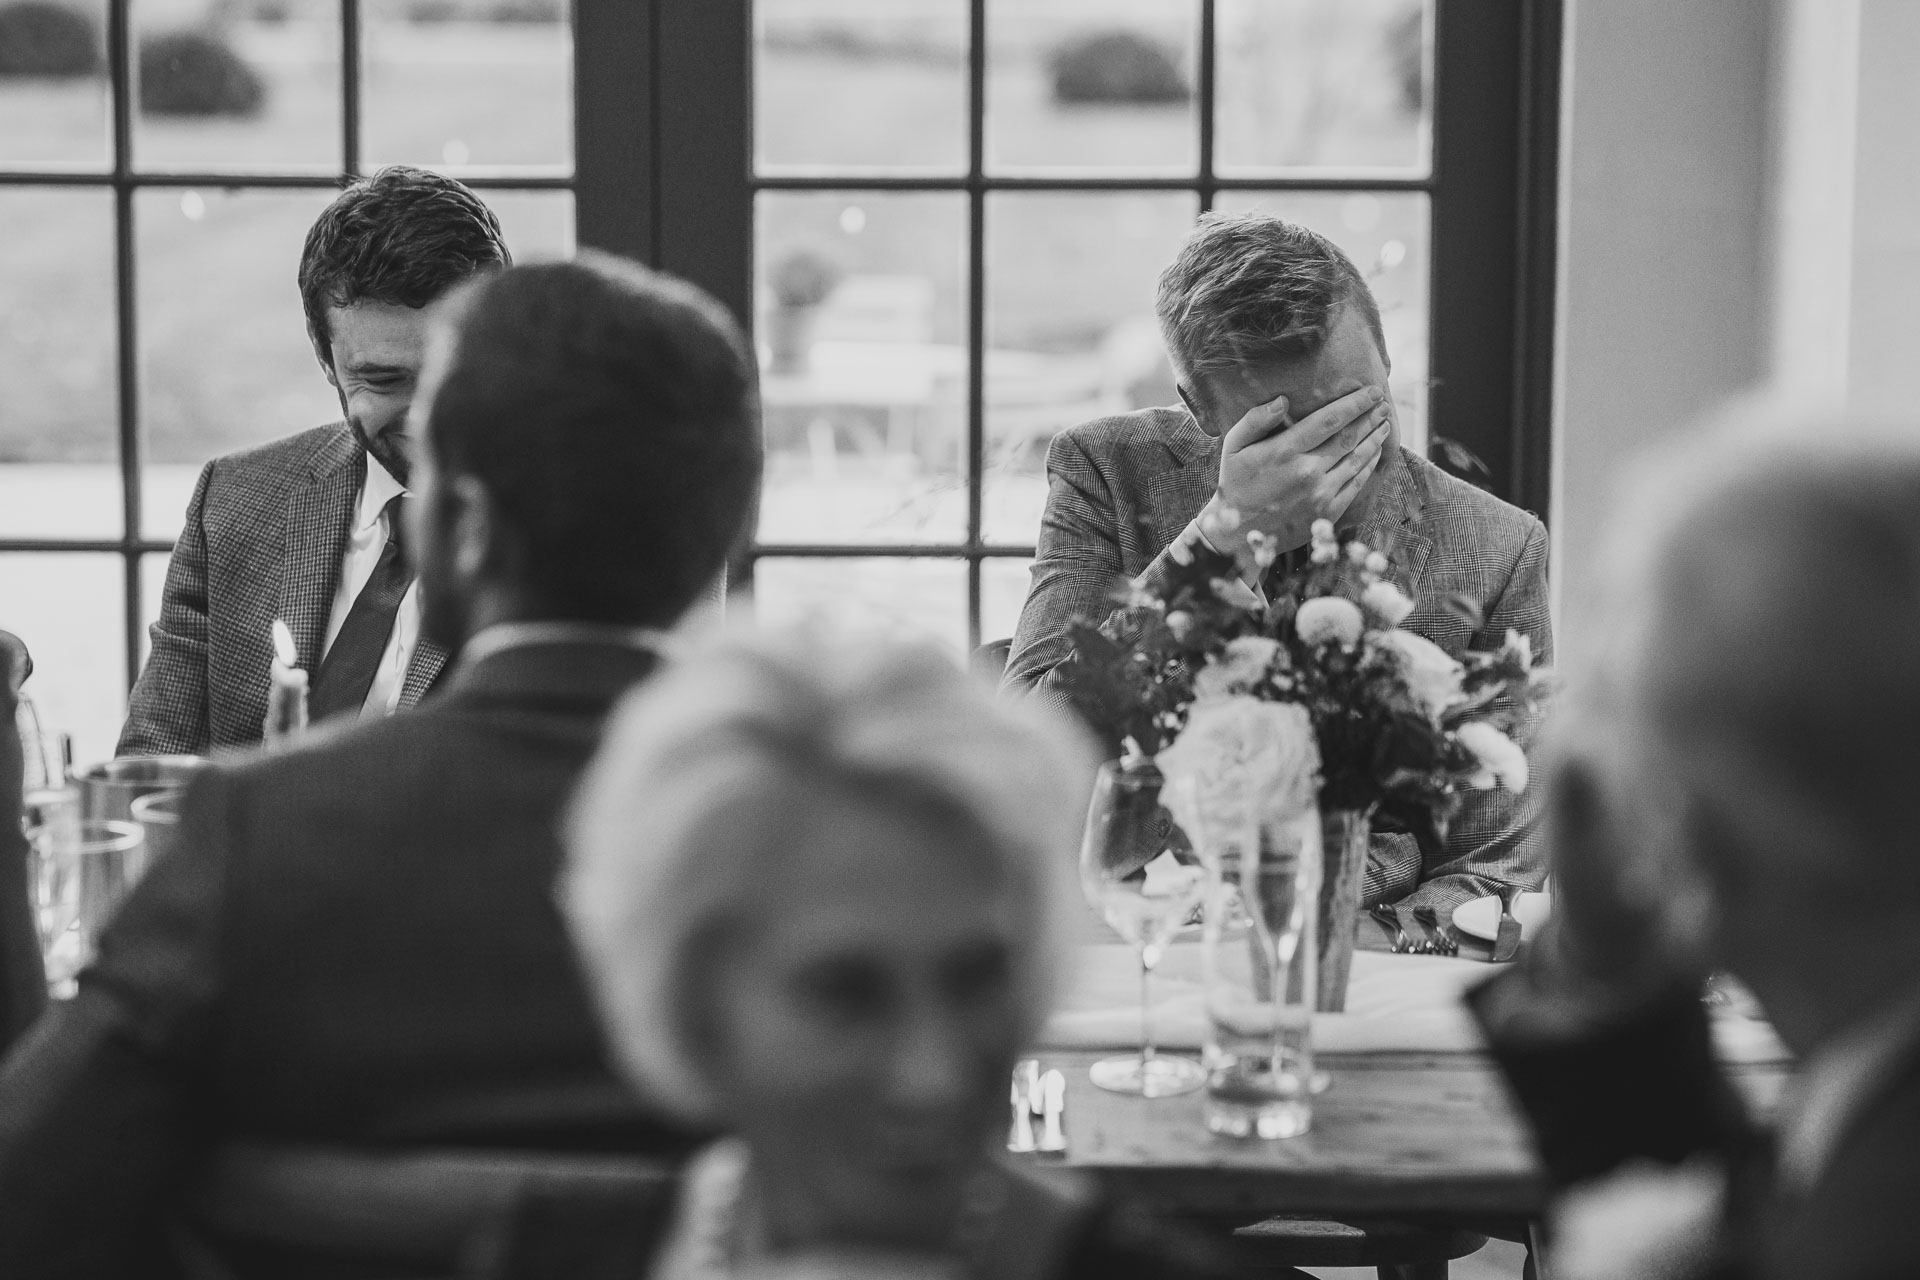 middleton_lodge_wedding_photographer-99.jpg